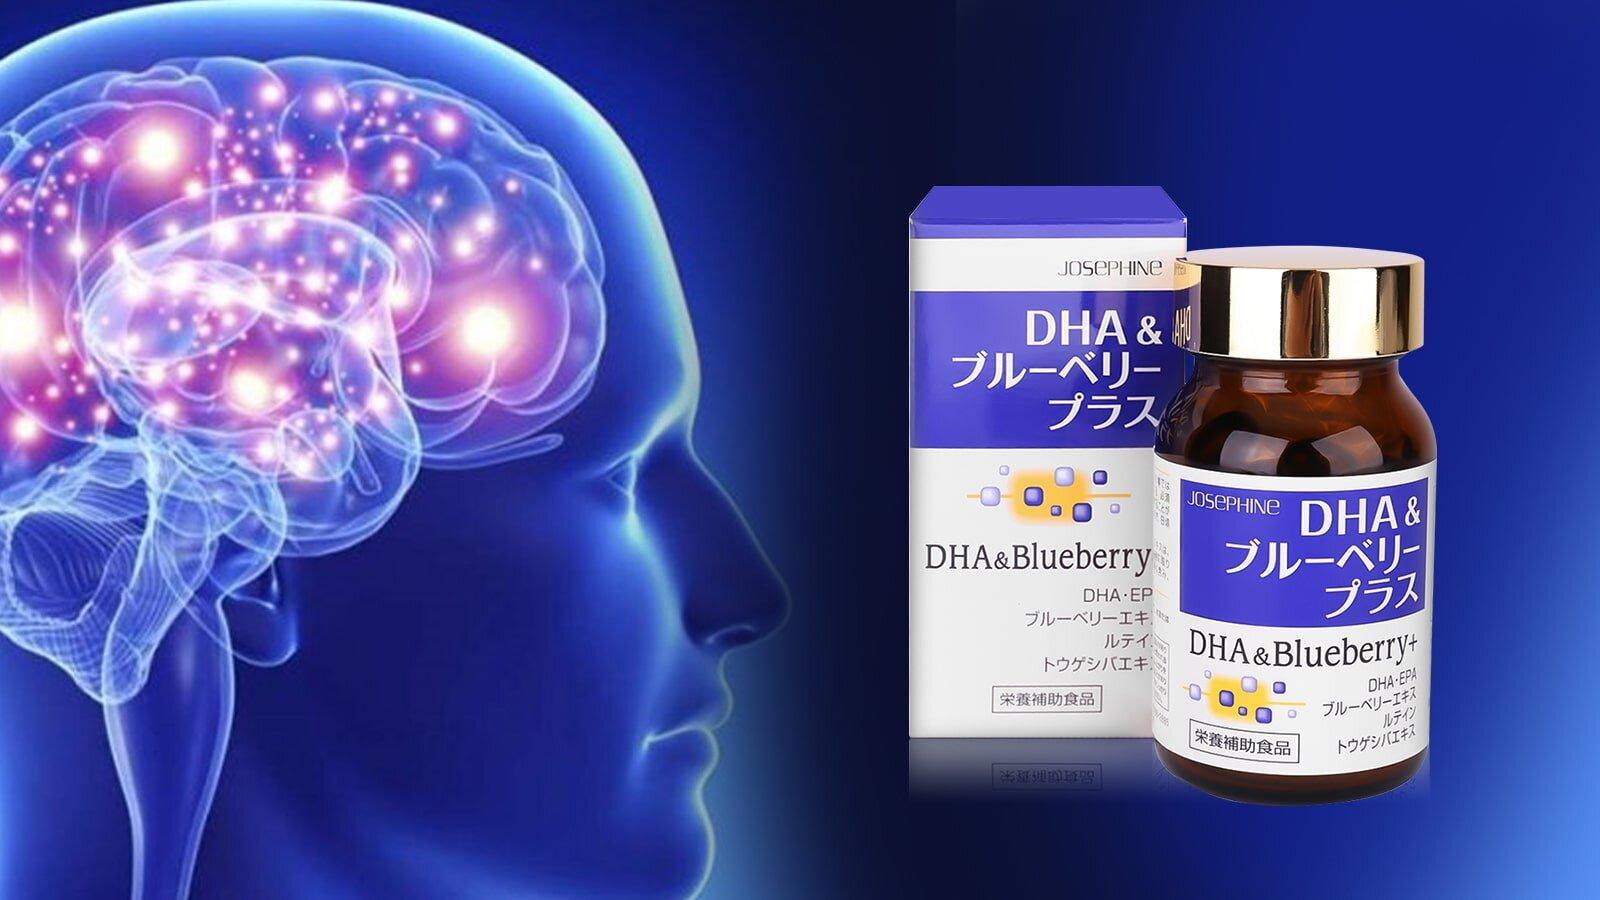 Josephine DHA & Blueberry Plus